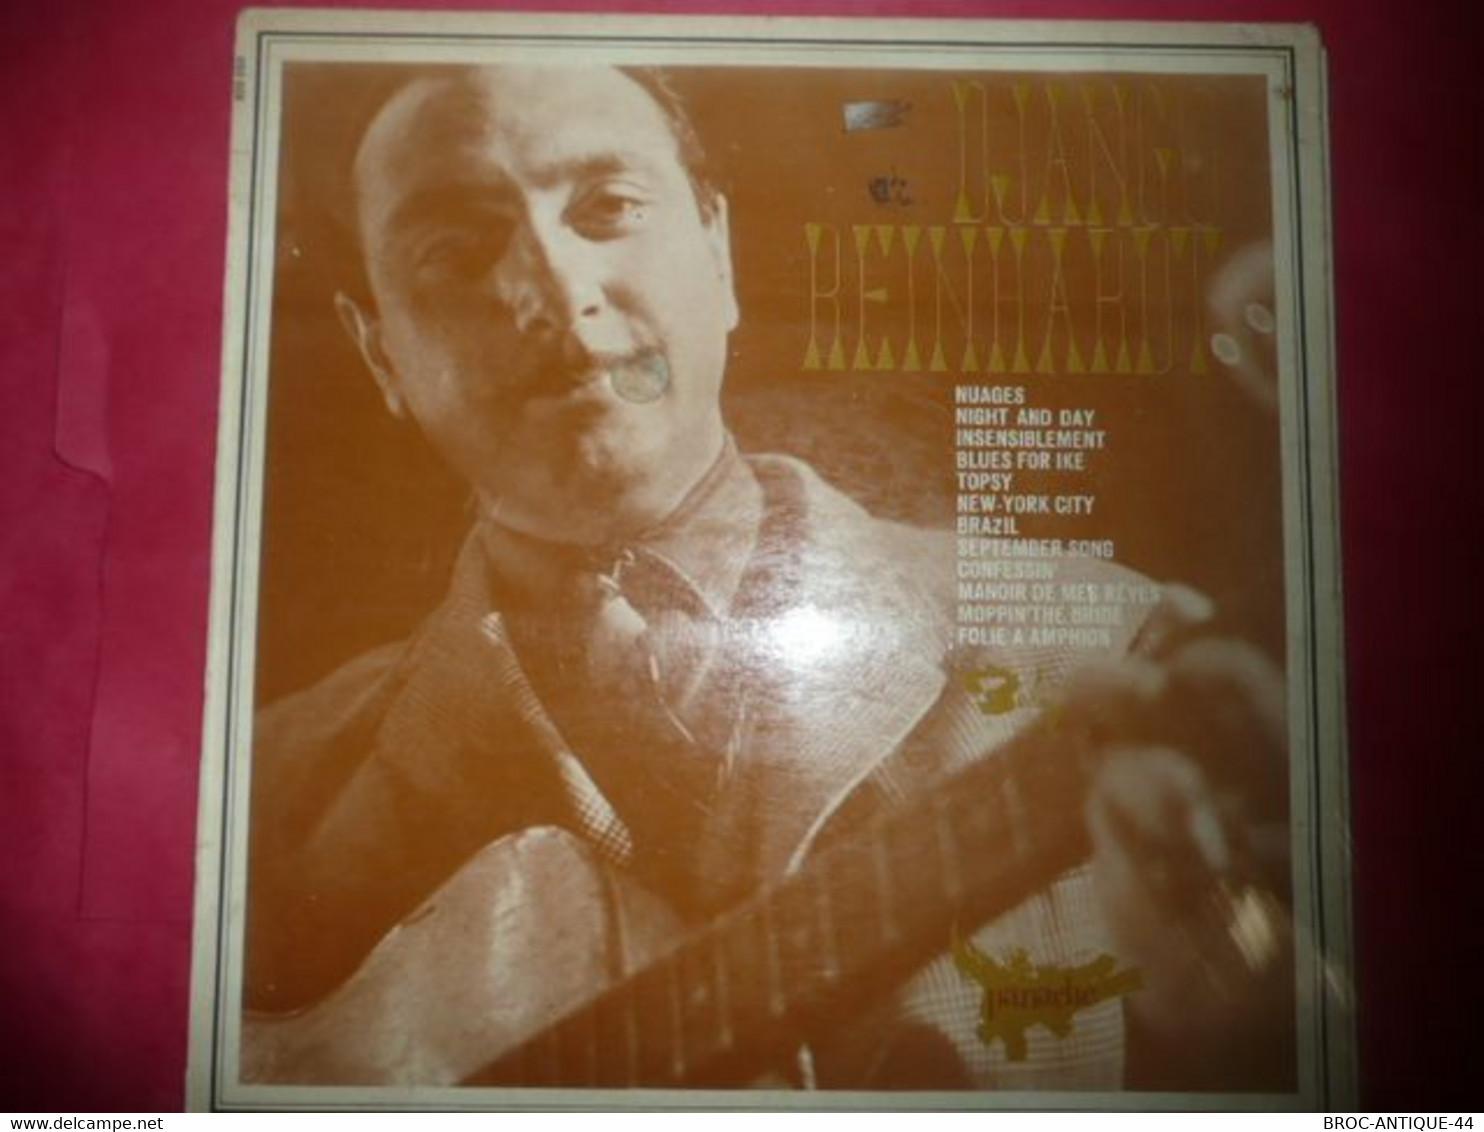 LP33 N°5997 - DJANGO REINHARDT - 820 050 - DISQUE EPAIS - JAZZ GYPSY - Jazz